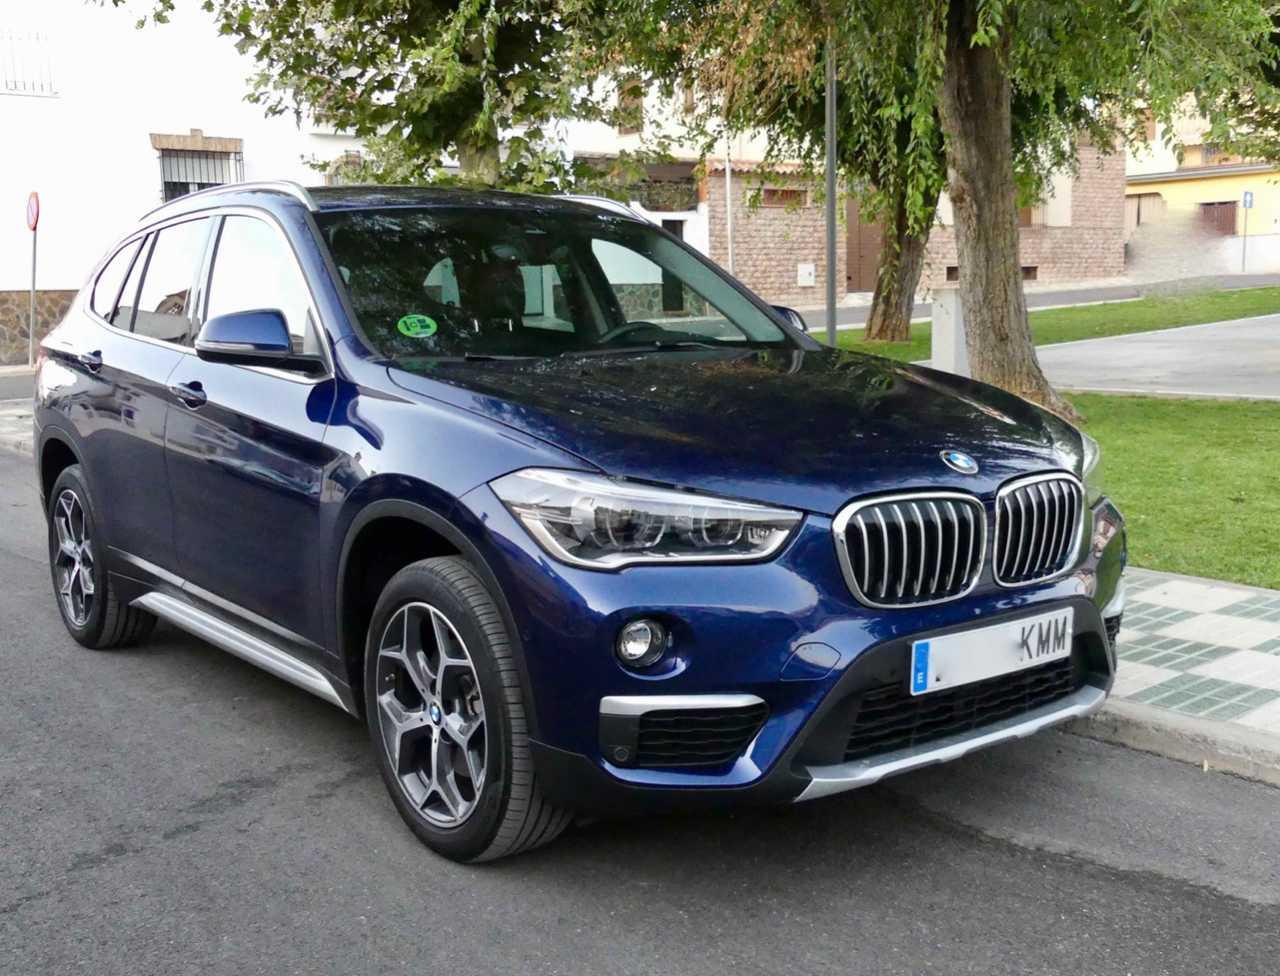 BMW X1 SDRIVE18D, AUT, X-LINE, NAVEGACION, CAMARA, ASIST. DE   - Foto 1